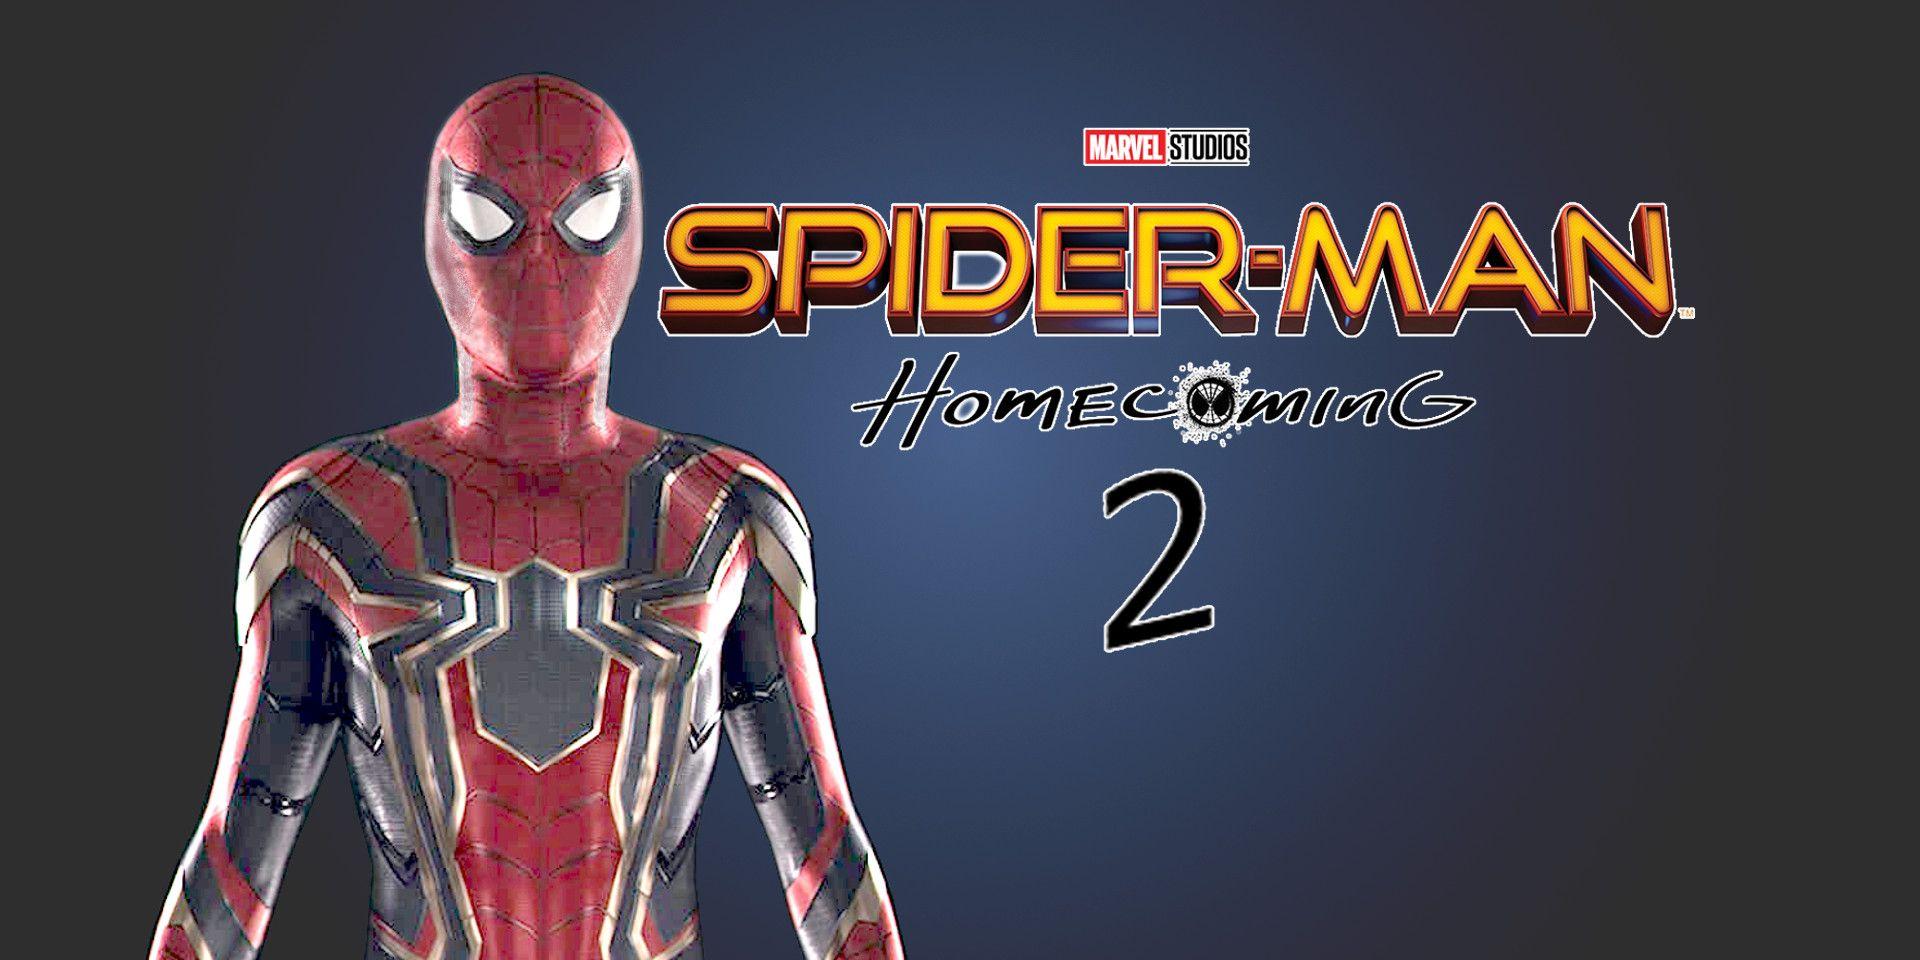 Movie Spiderman: Homecoming 2 (2019) 68